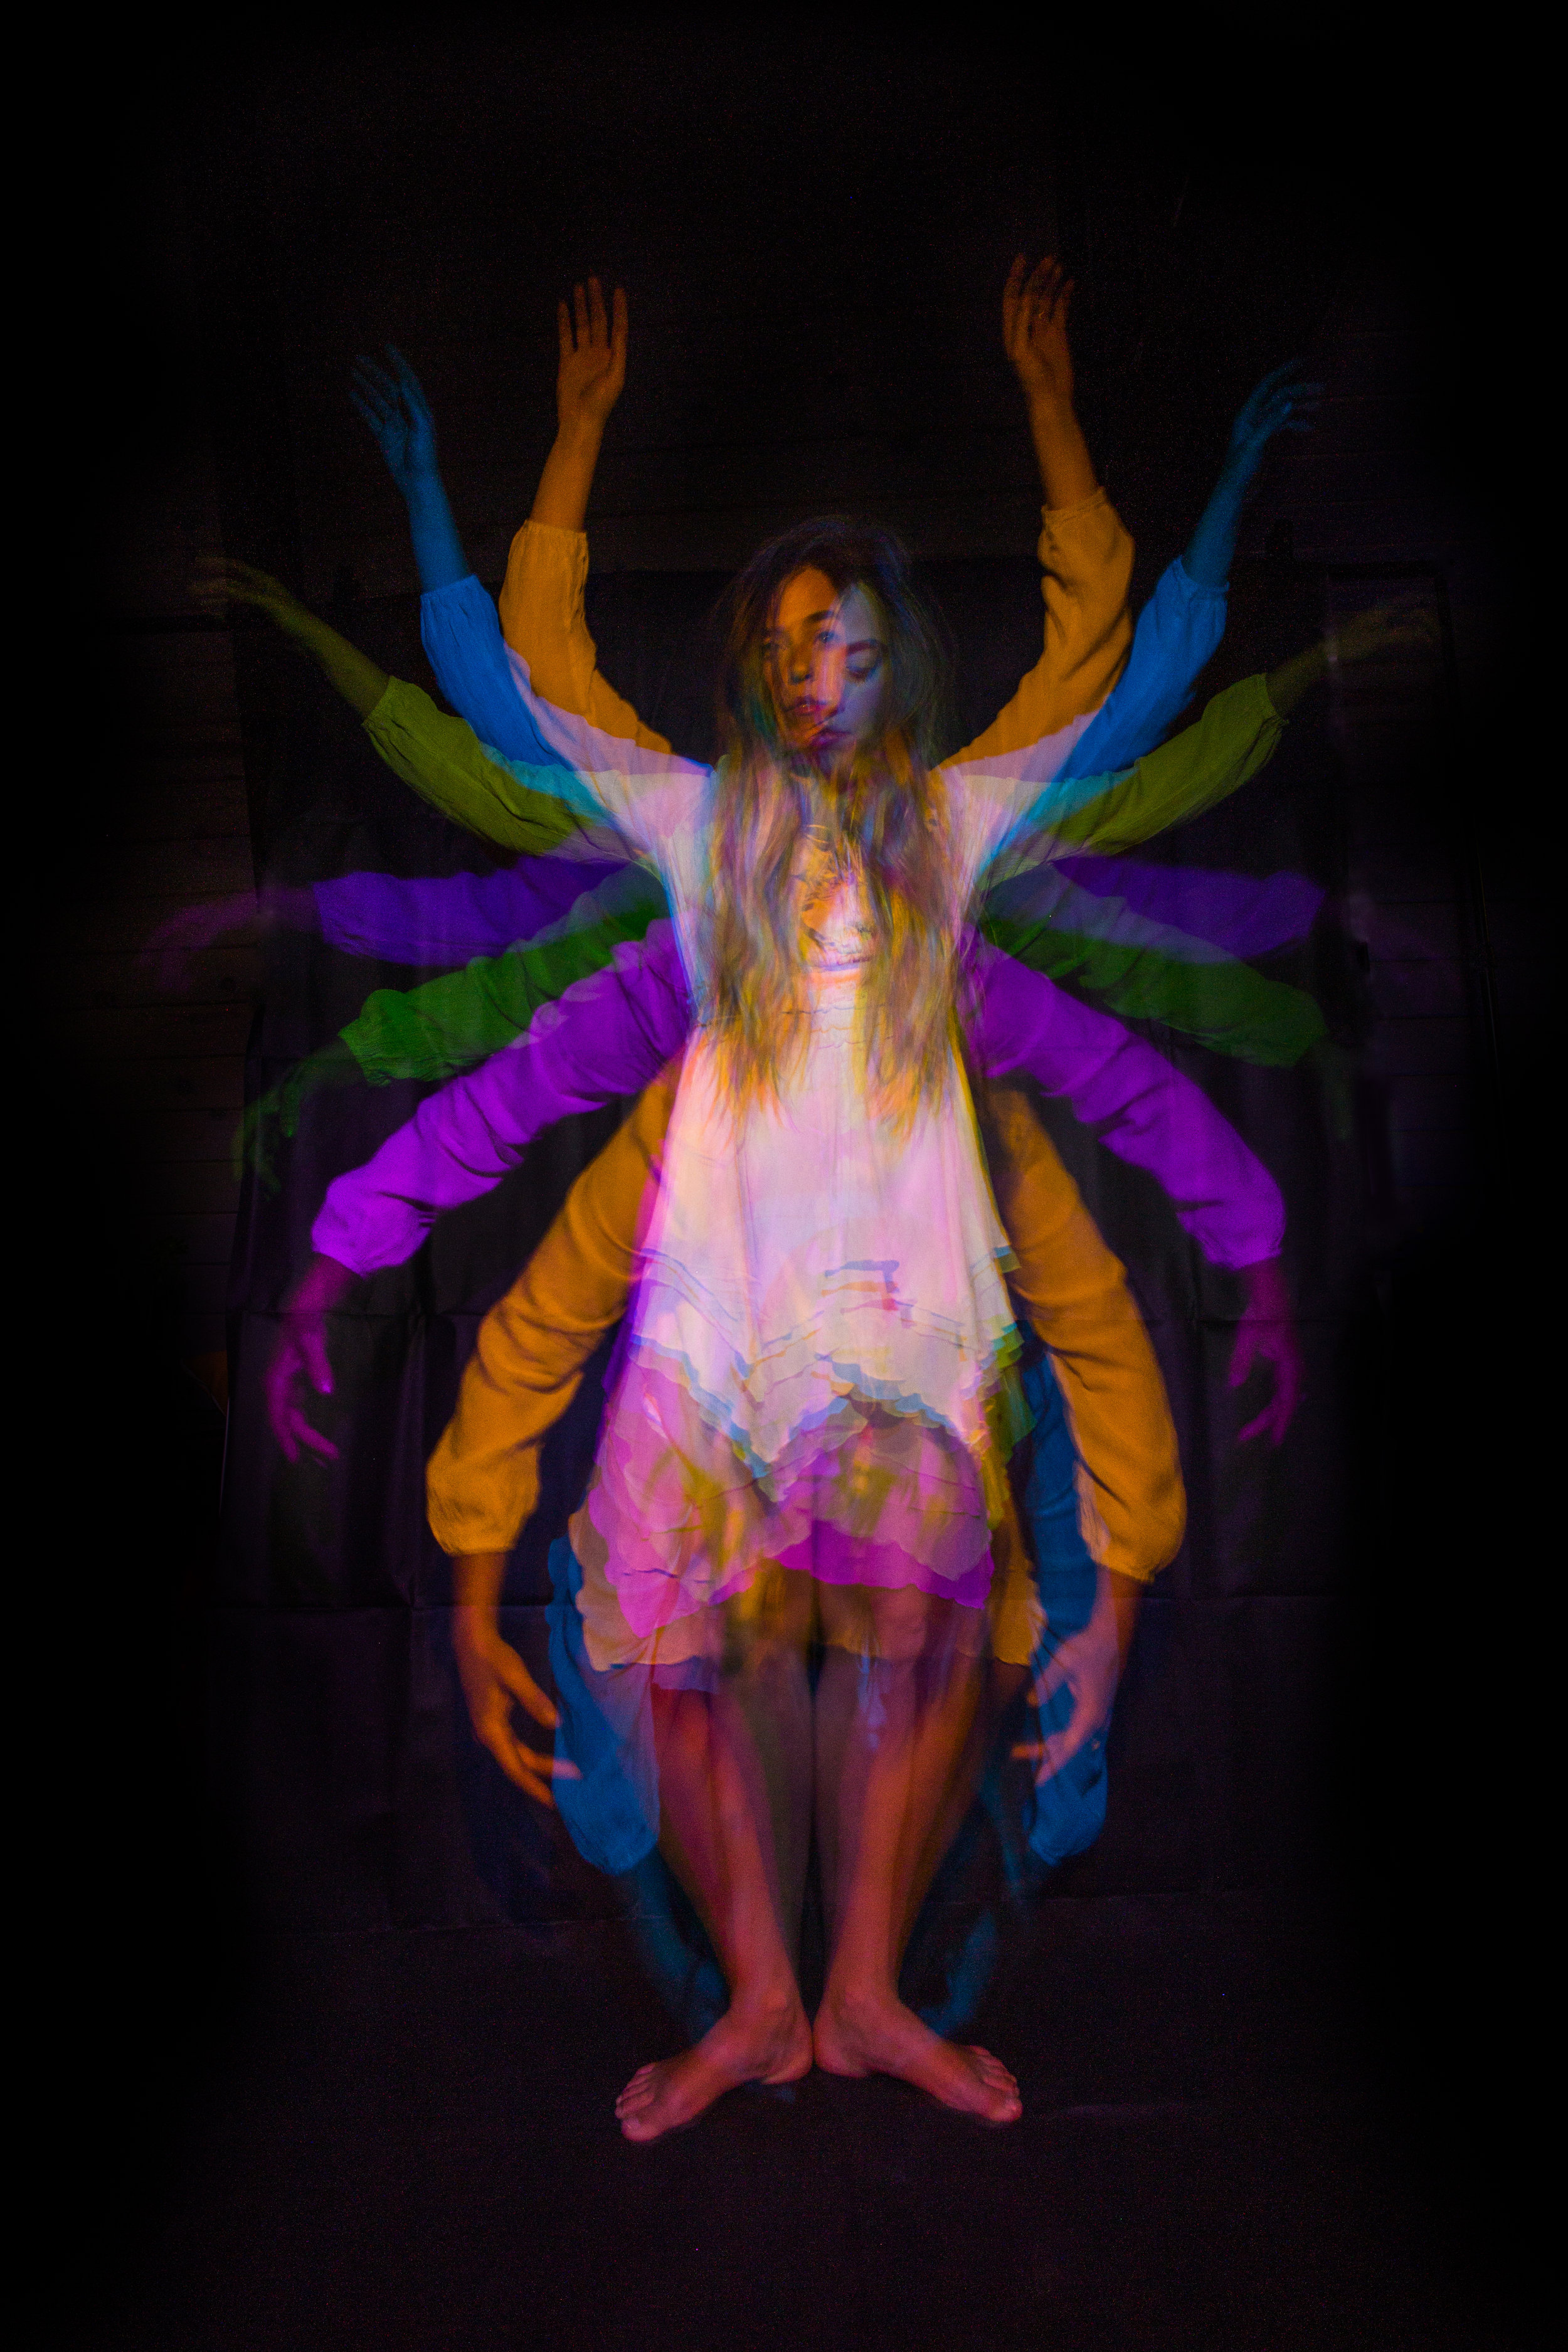 JordanRose_DarrenPearson_AstroBandit_DariusTwin_lightpainting_psychedelic_dancer_1.jpg